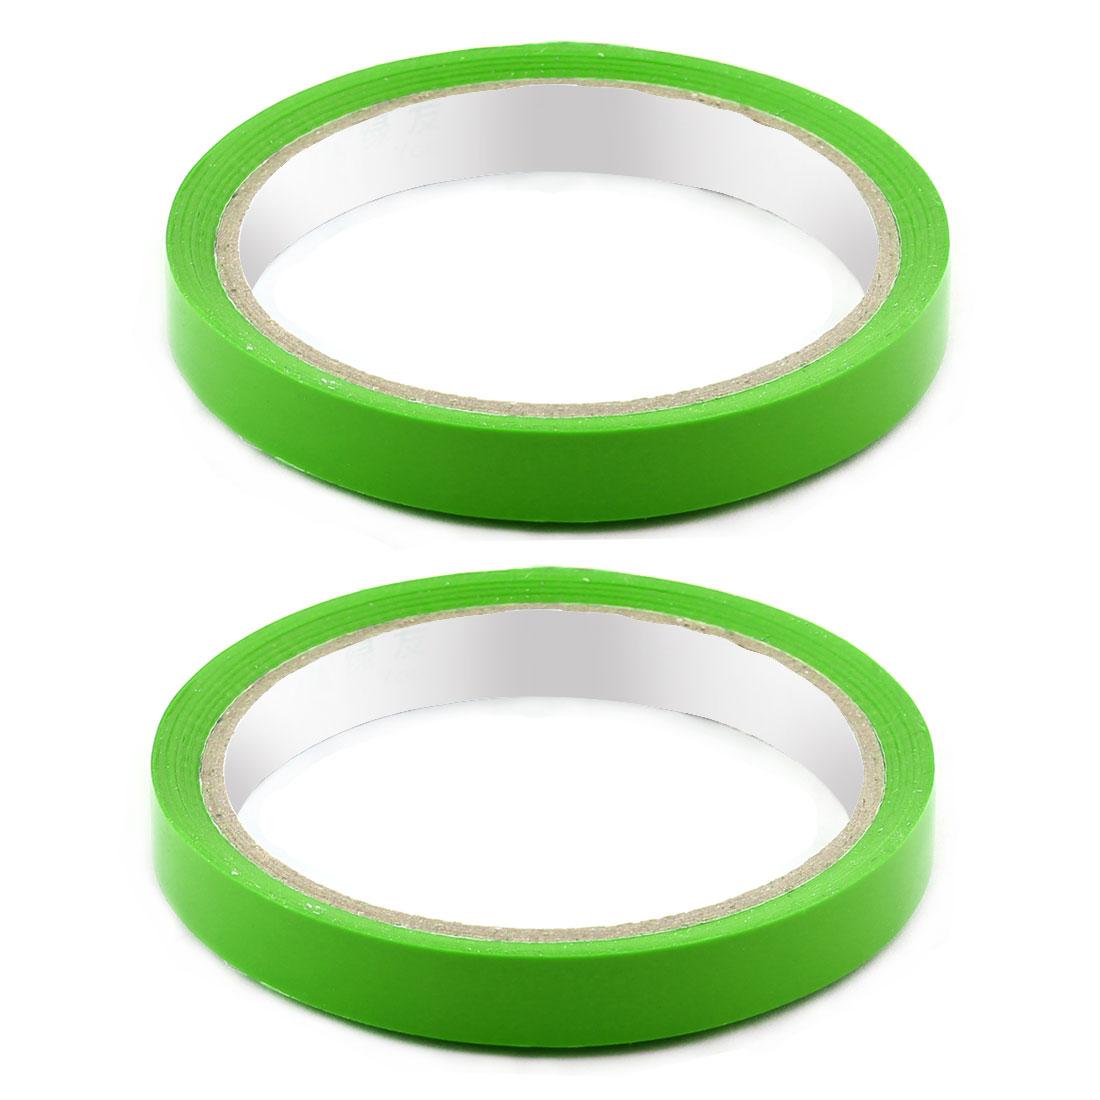 Supermarket PVC Vagetable Bag Neck Sealing Adhesive Tape Green 1.2cm Width 2pcs